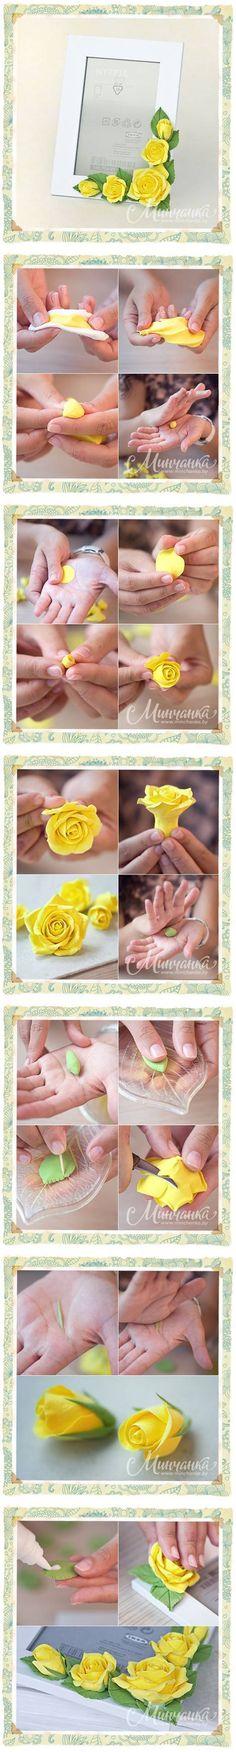 DIY Beautiful Clay Yellow Rose DIY Projects | UsefulDIY.com